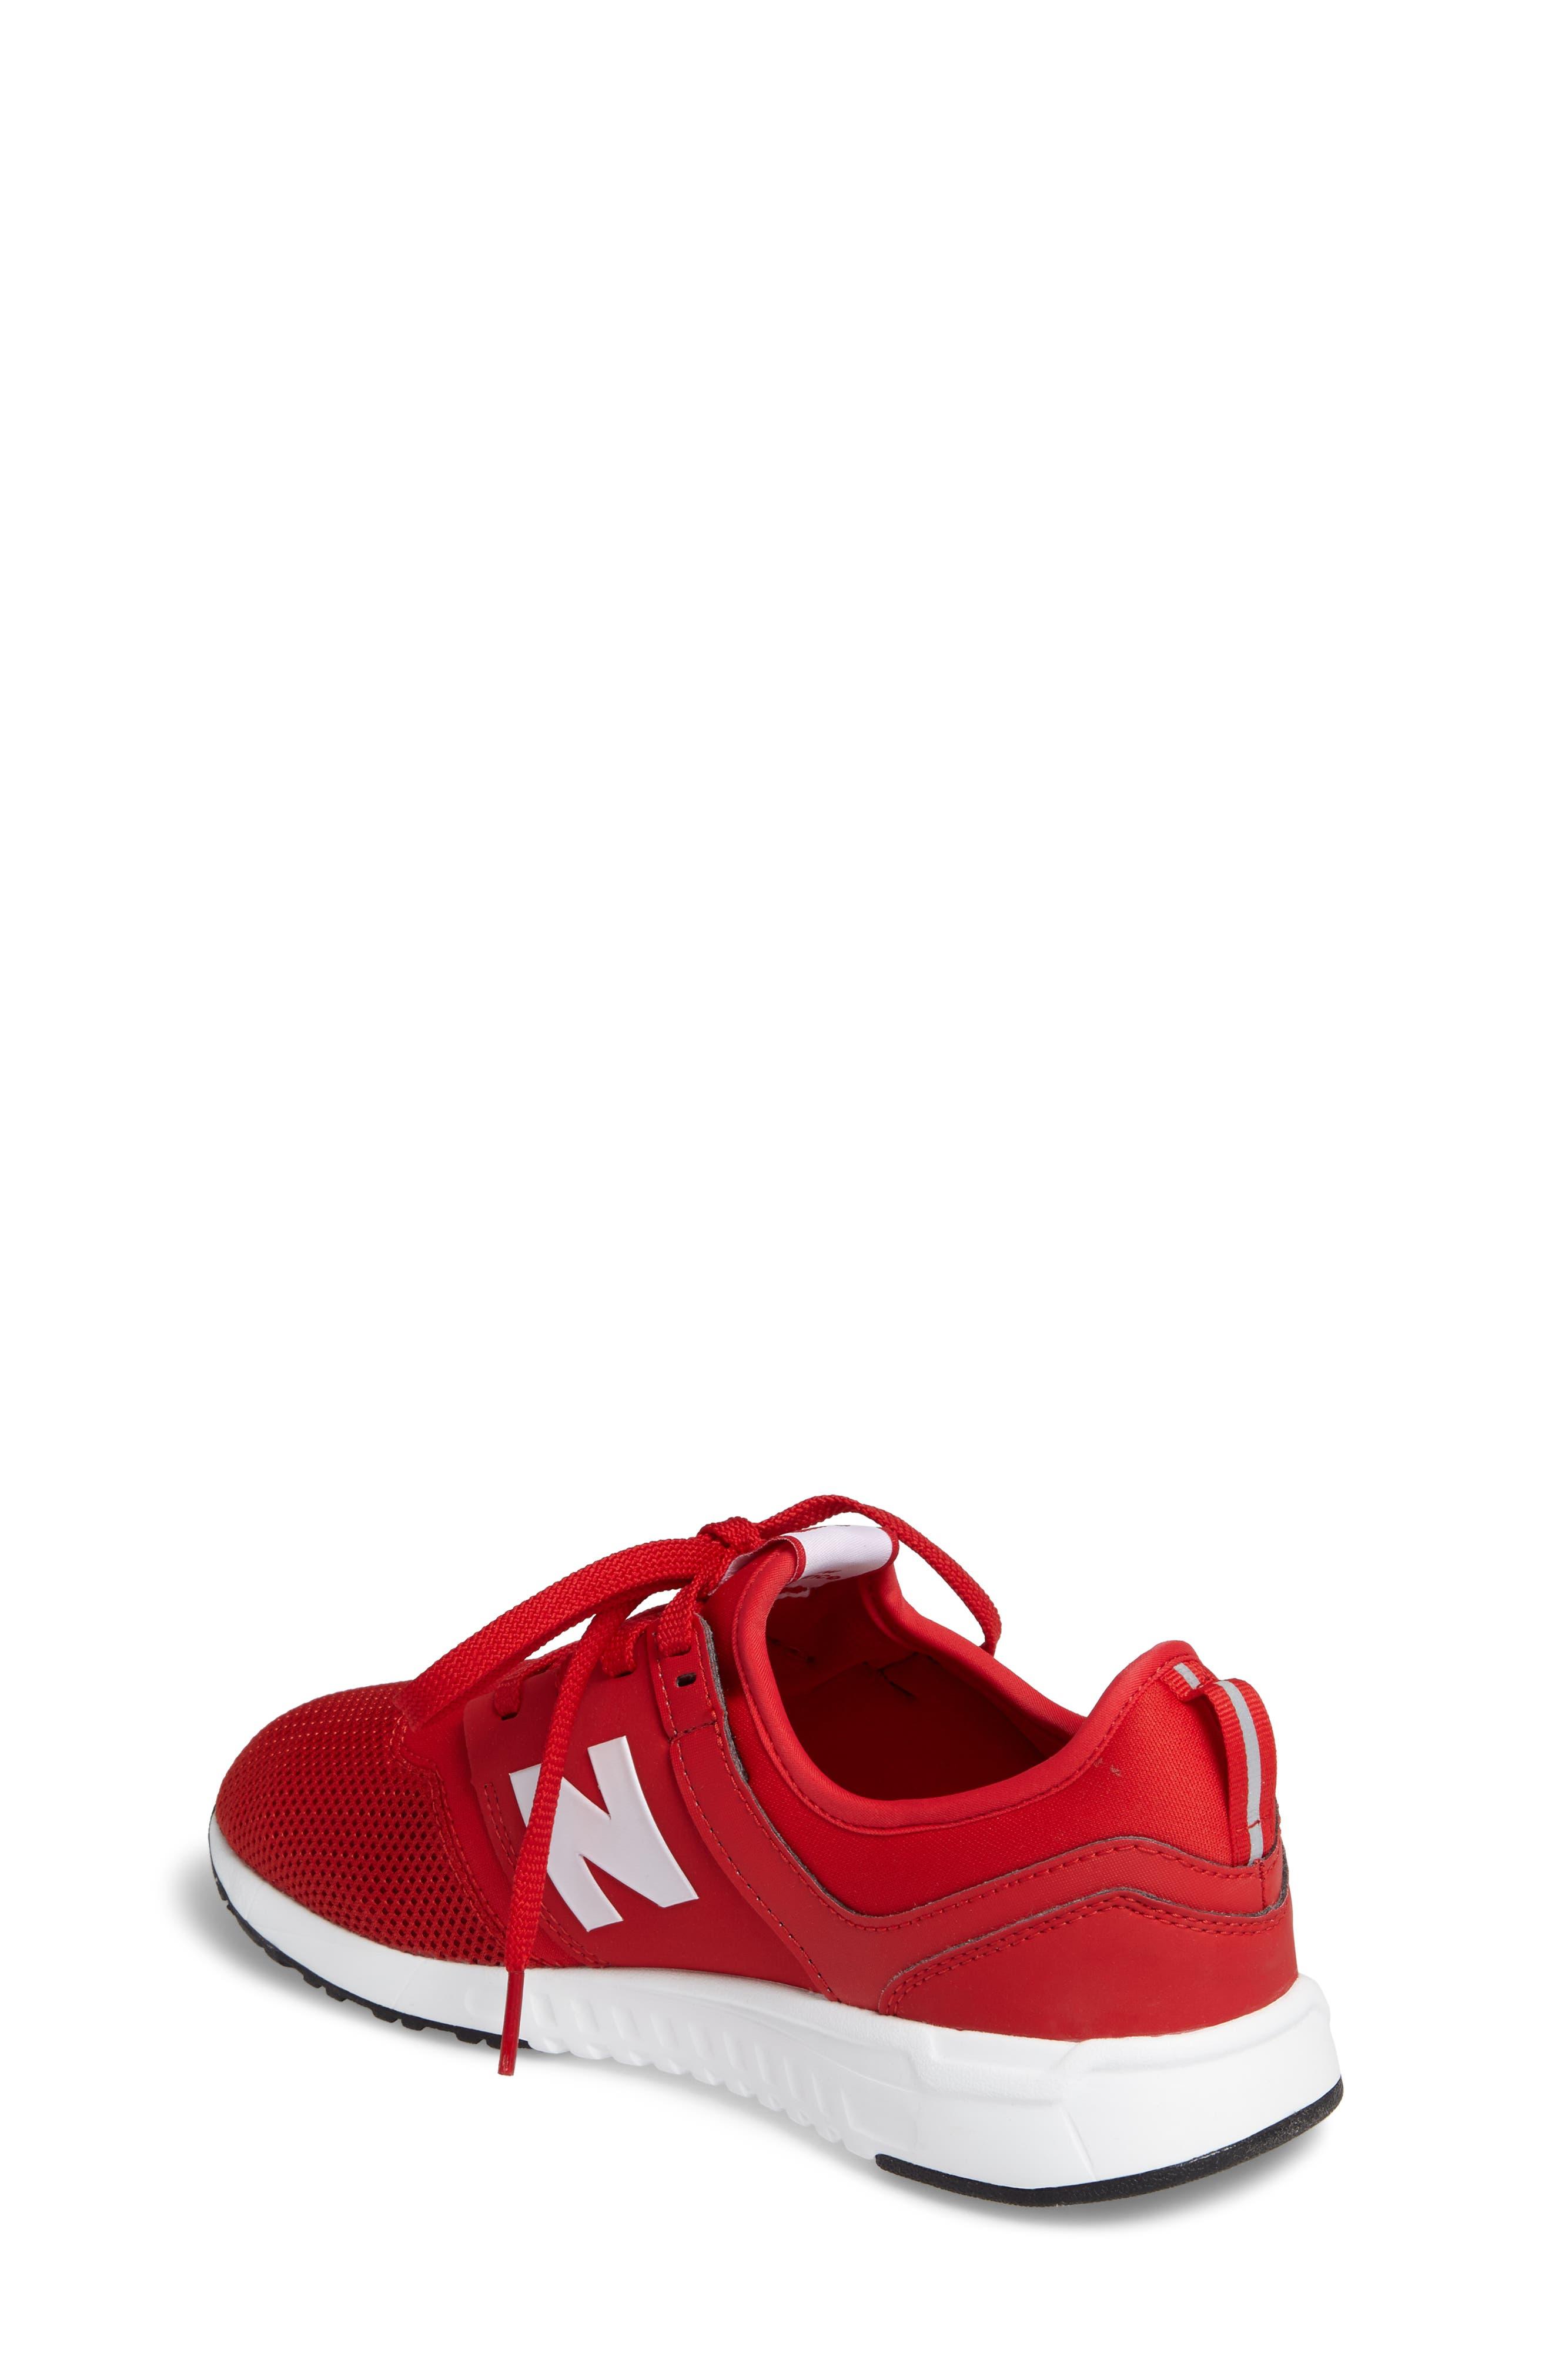 247 Core Sneaker,                             Alternate thumbnail 4, color,